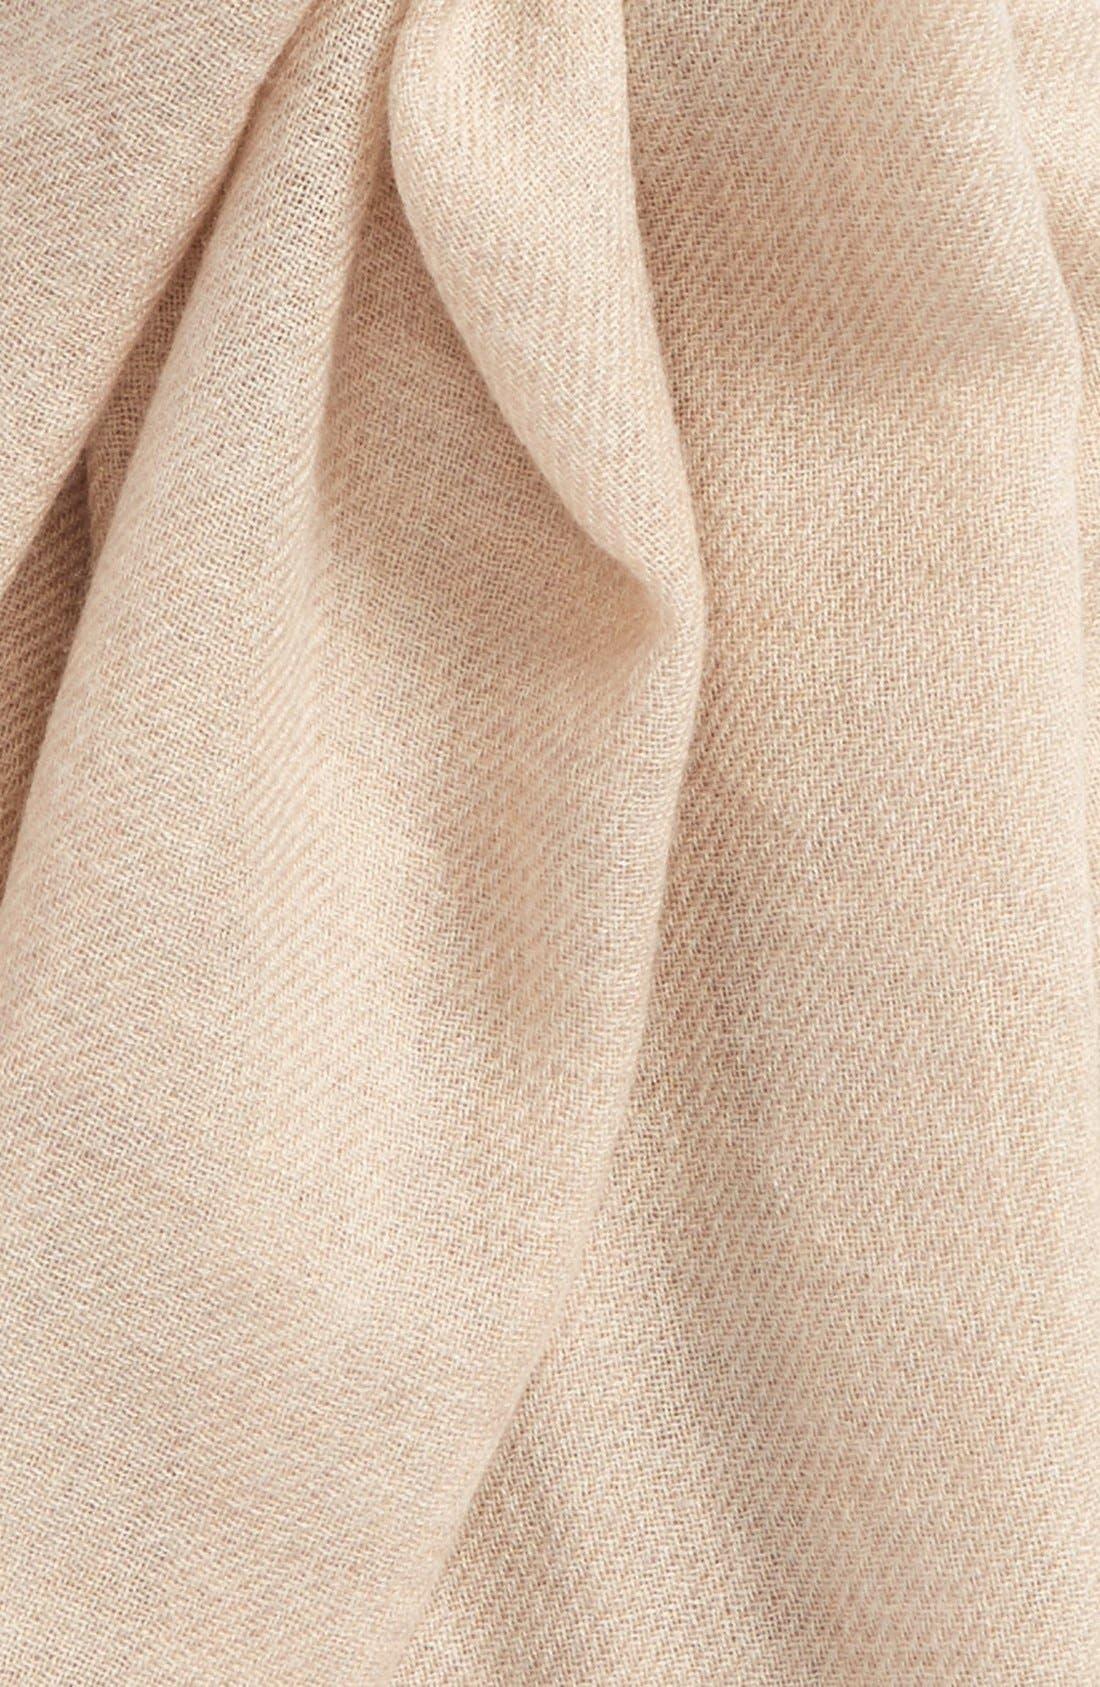 Wool & Cashmere Wrap,                             Alternate thumbnail 49, color,